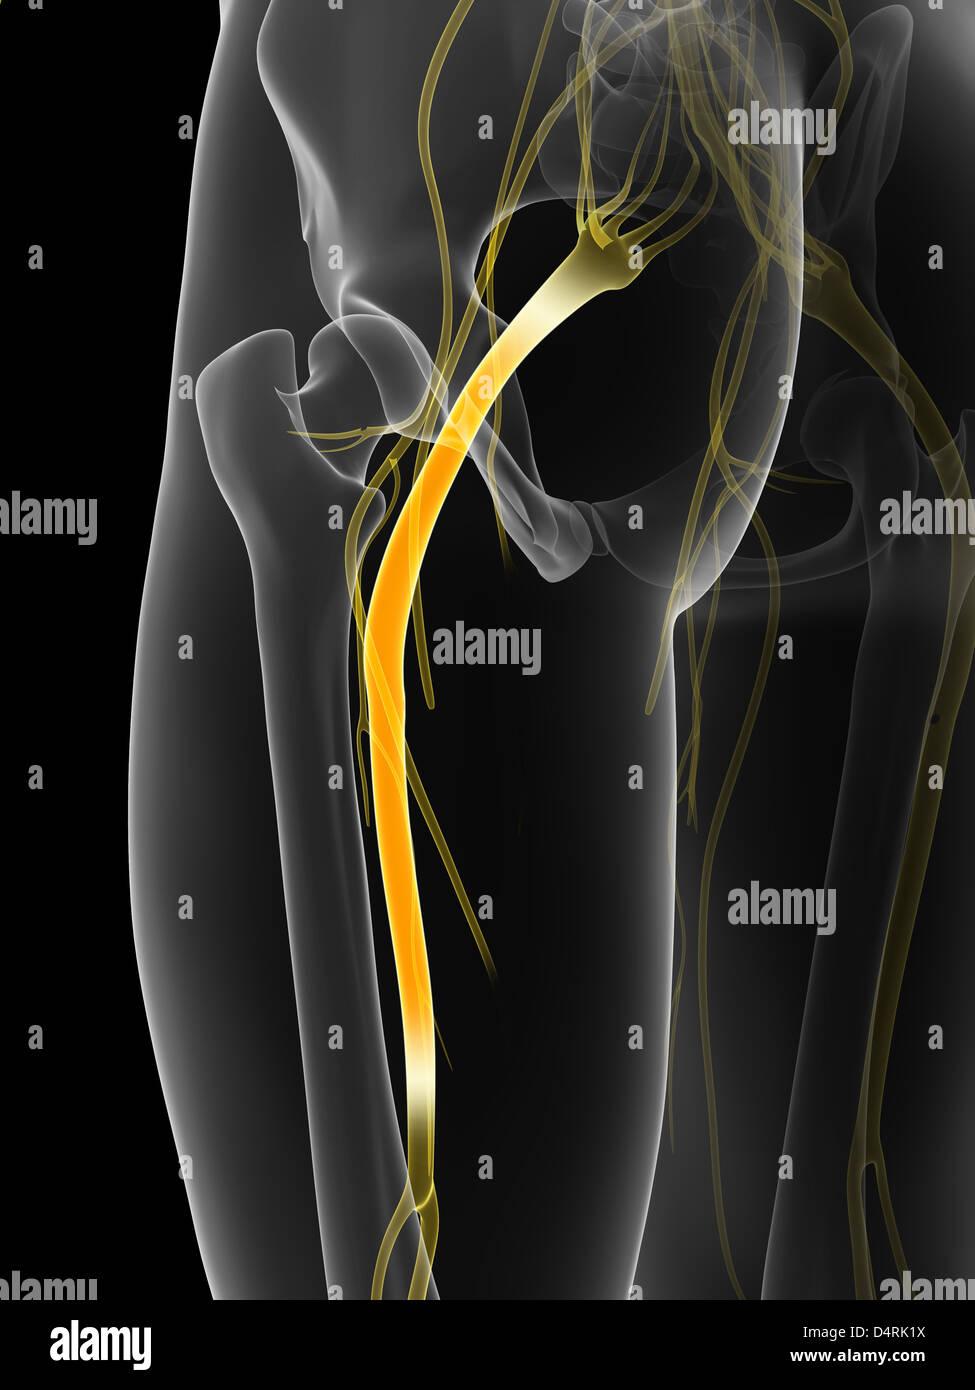 Sciatic Nerve Stock Photos & Sciatic Nerve Stock Images - Alamy